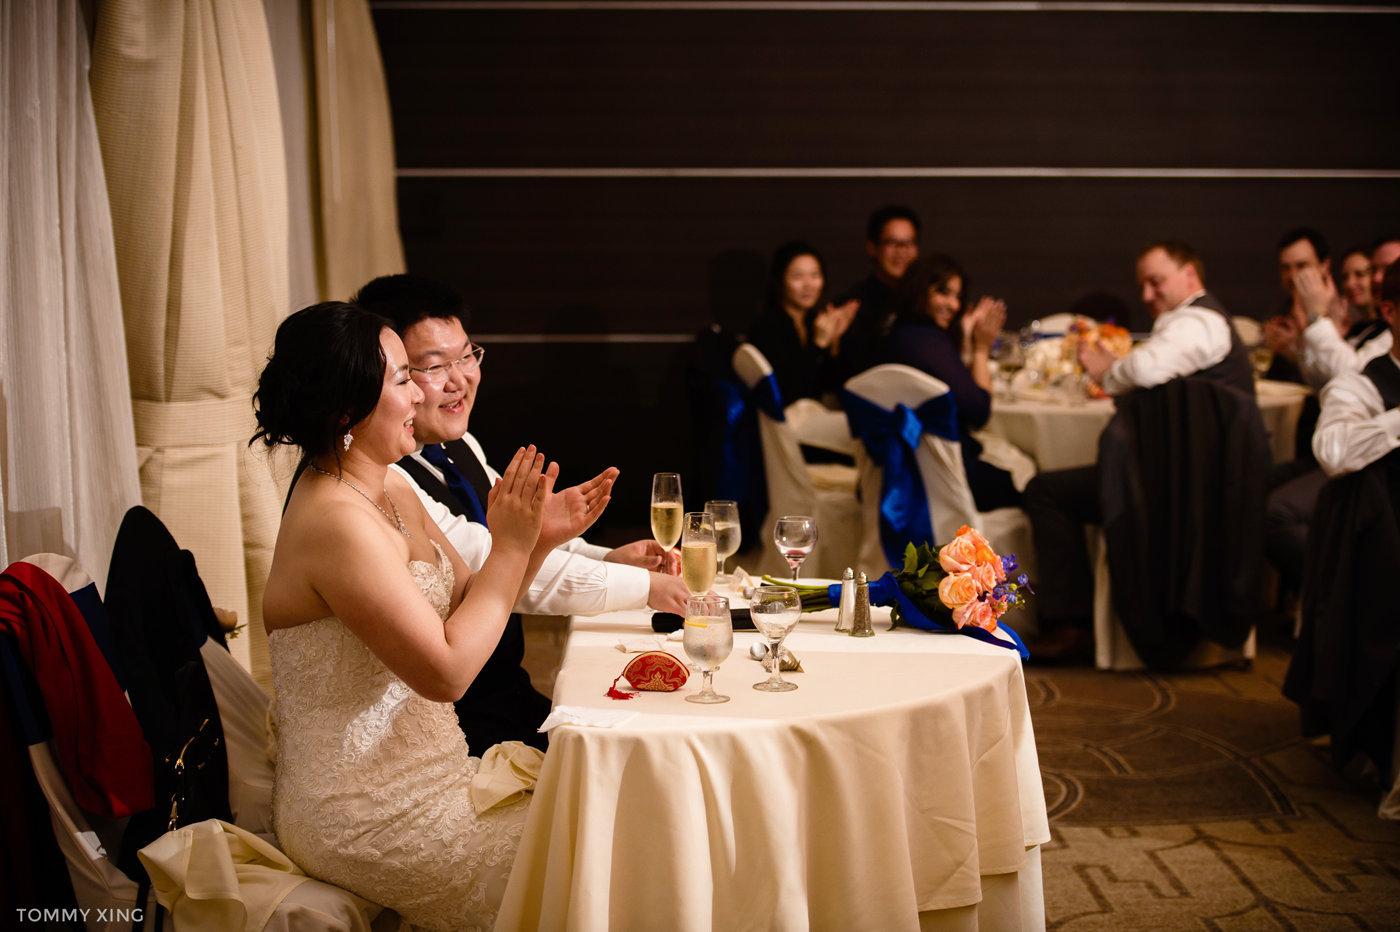 STANFORD MEMORIAL CHURCH WEDDING - Wenjie & Chengcheng - SAN FRANCISCO BAY AREA 斯坦福教堂婚礼跟拍 - 洛杉矶婚礼婚纱照摄影师 Tommy Xing Photography200.jpg